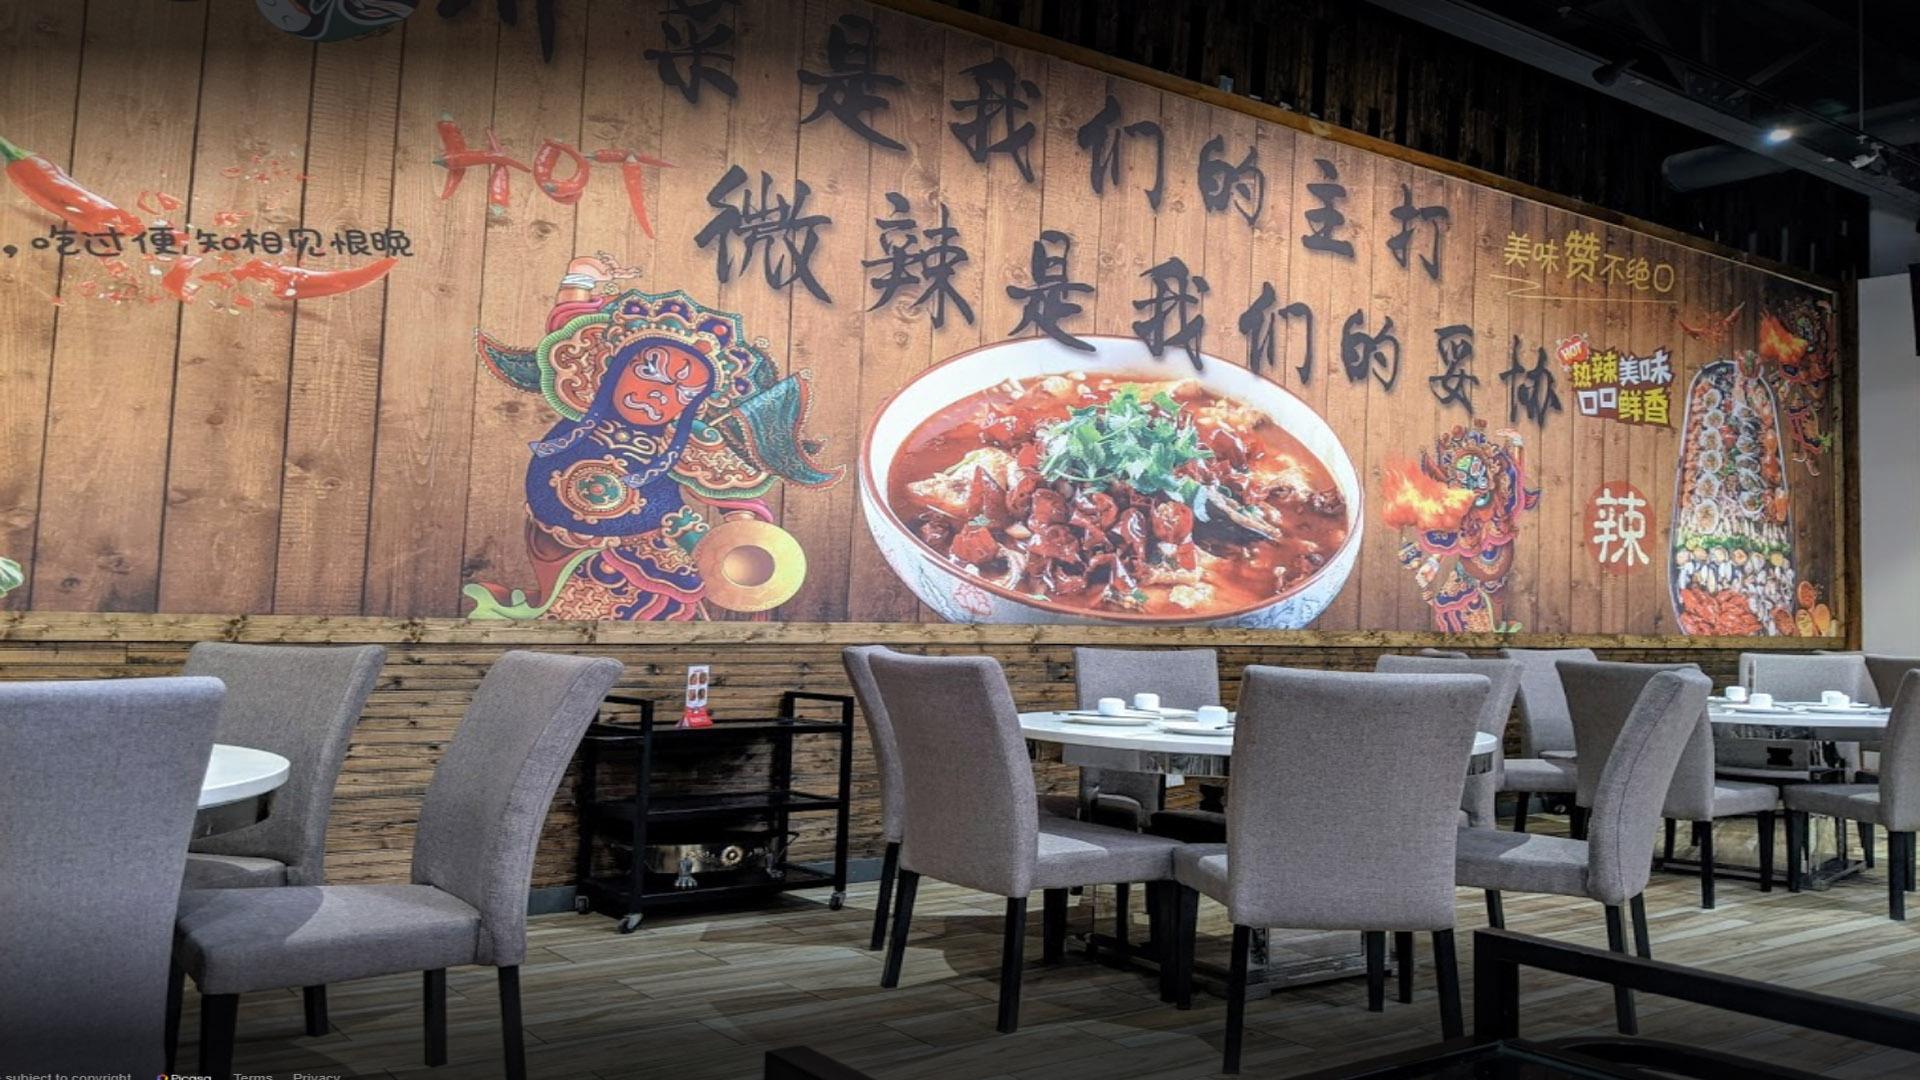 Taste of Szechuan Cuisine